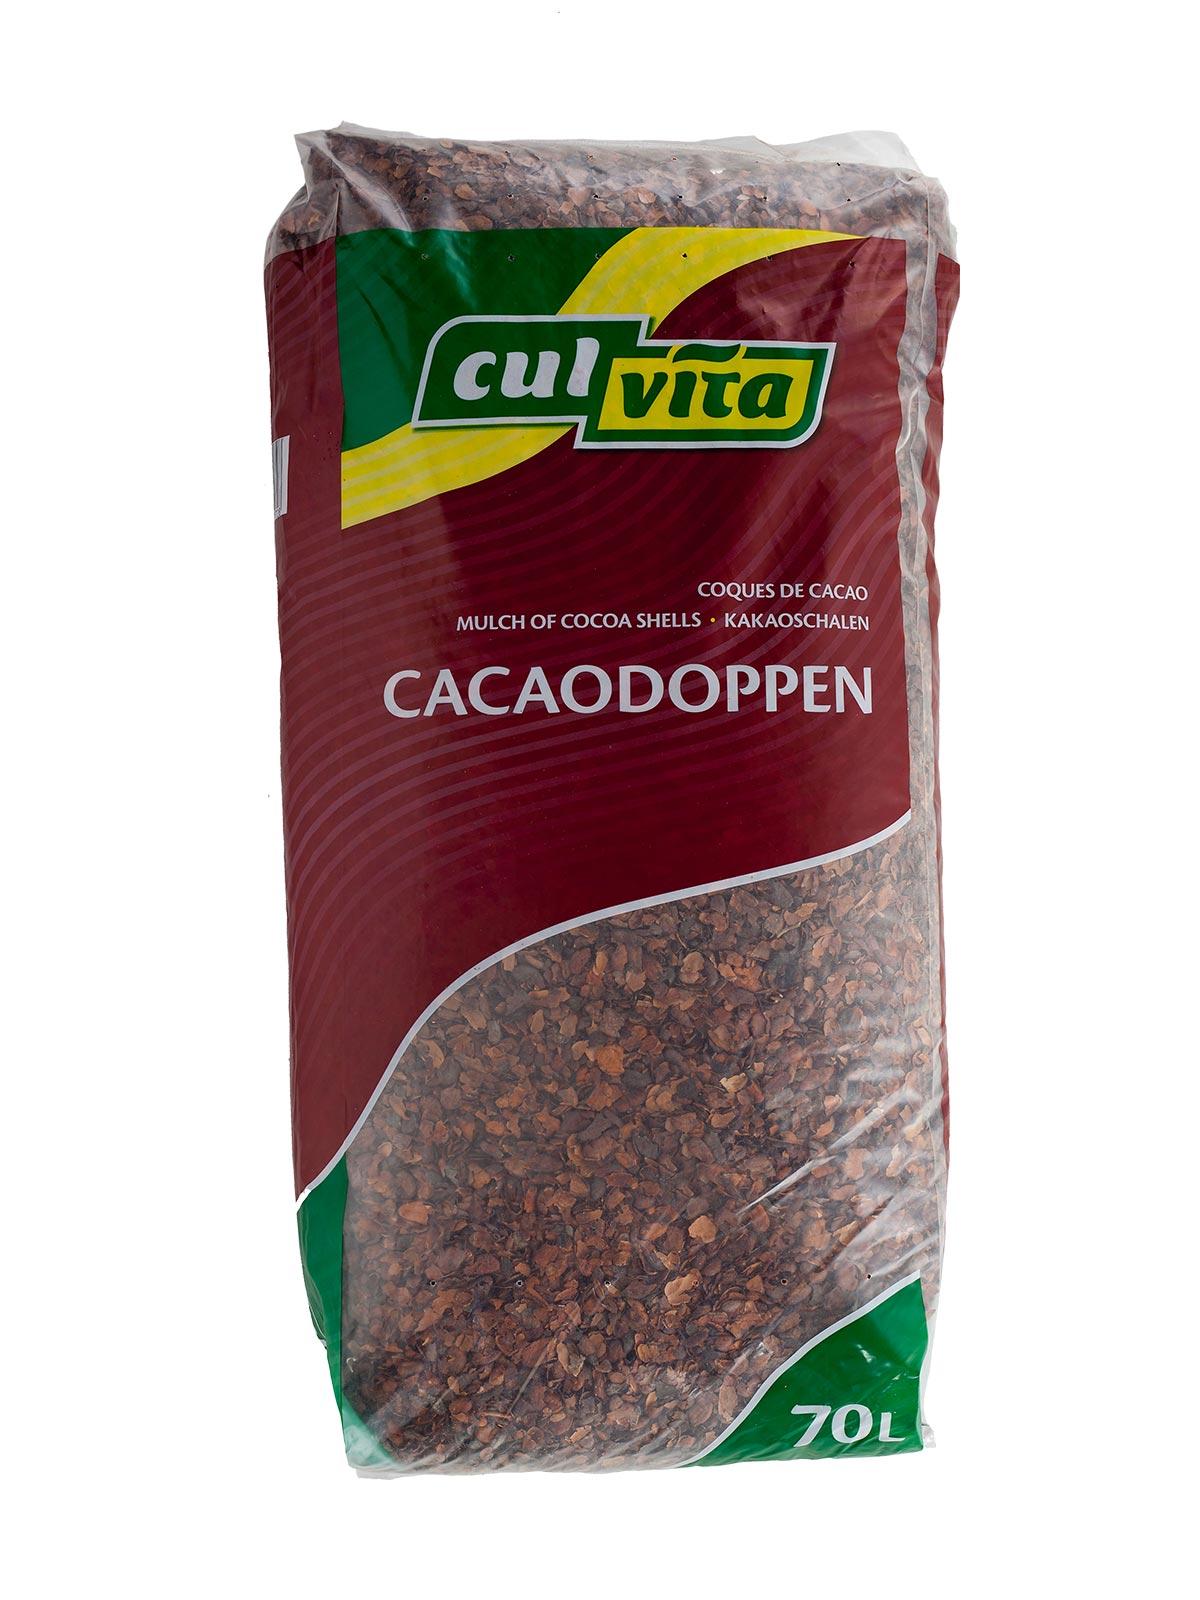 Culvita Cacaodoppen | Culvita.nl